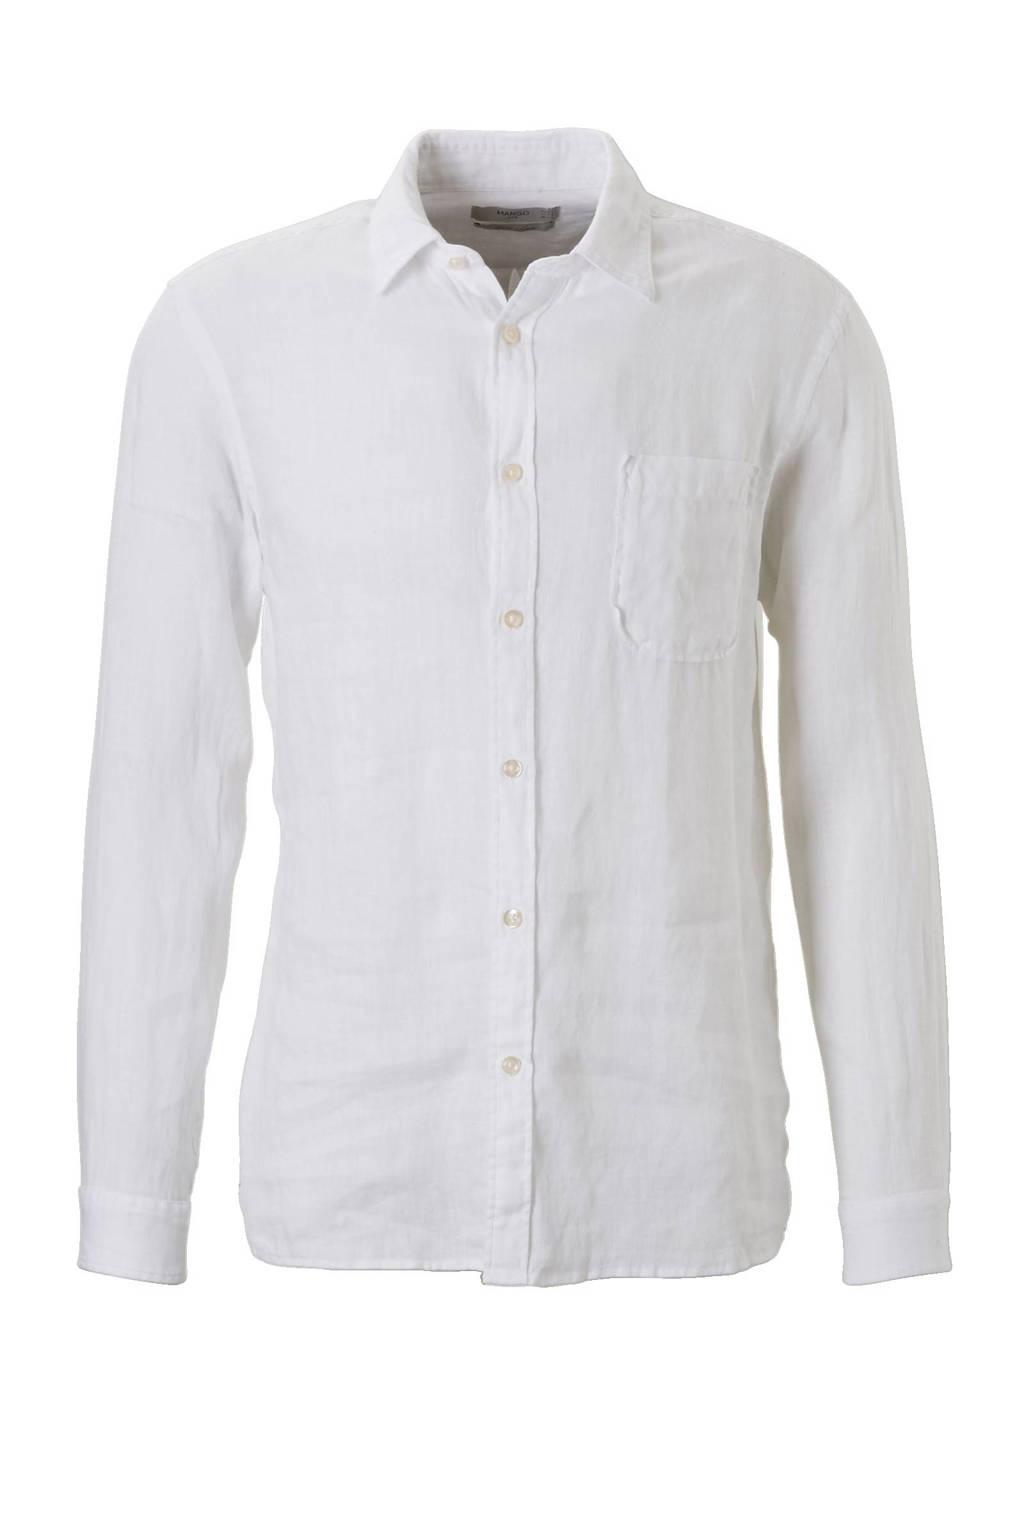 Linnen Overhemd Wit Heren.Mango Man Linnen Slim Fit Overhemd Wit Wehkamp